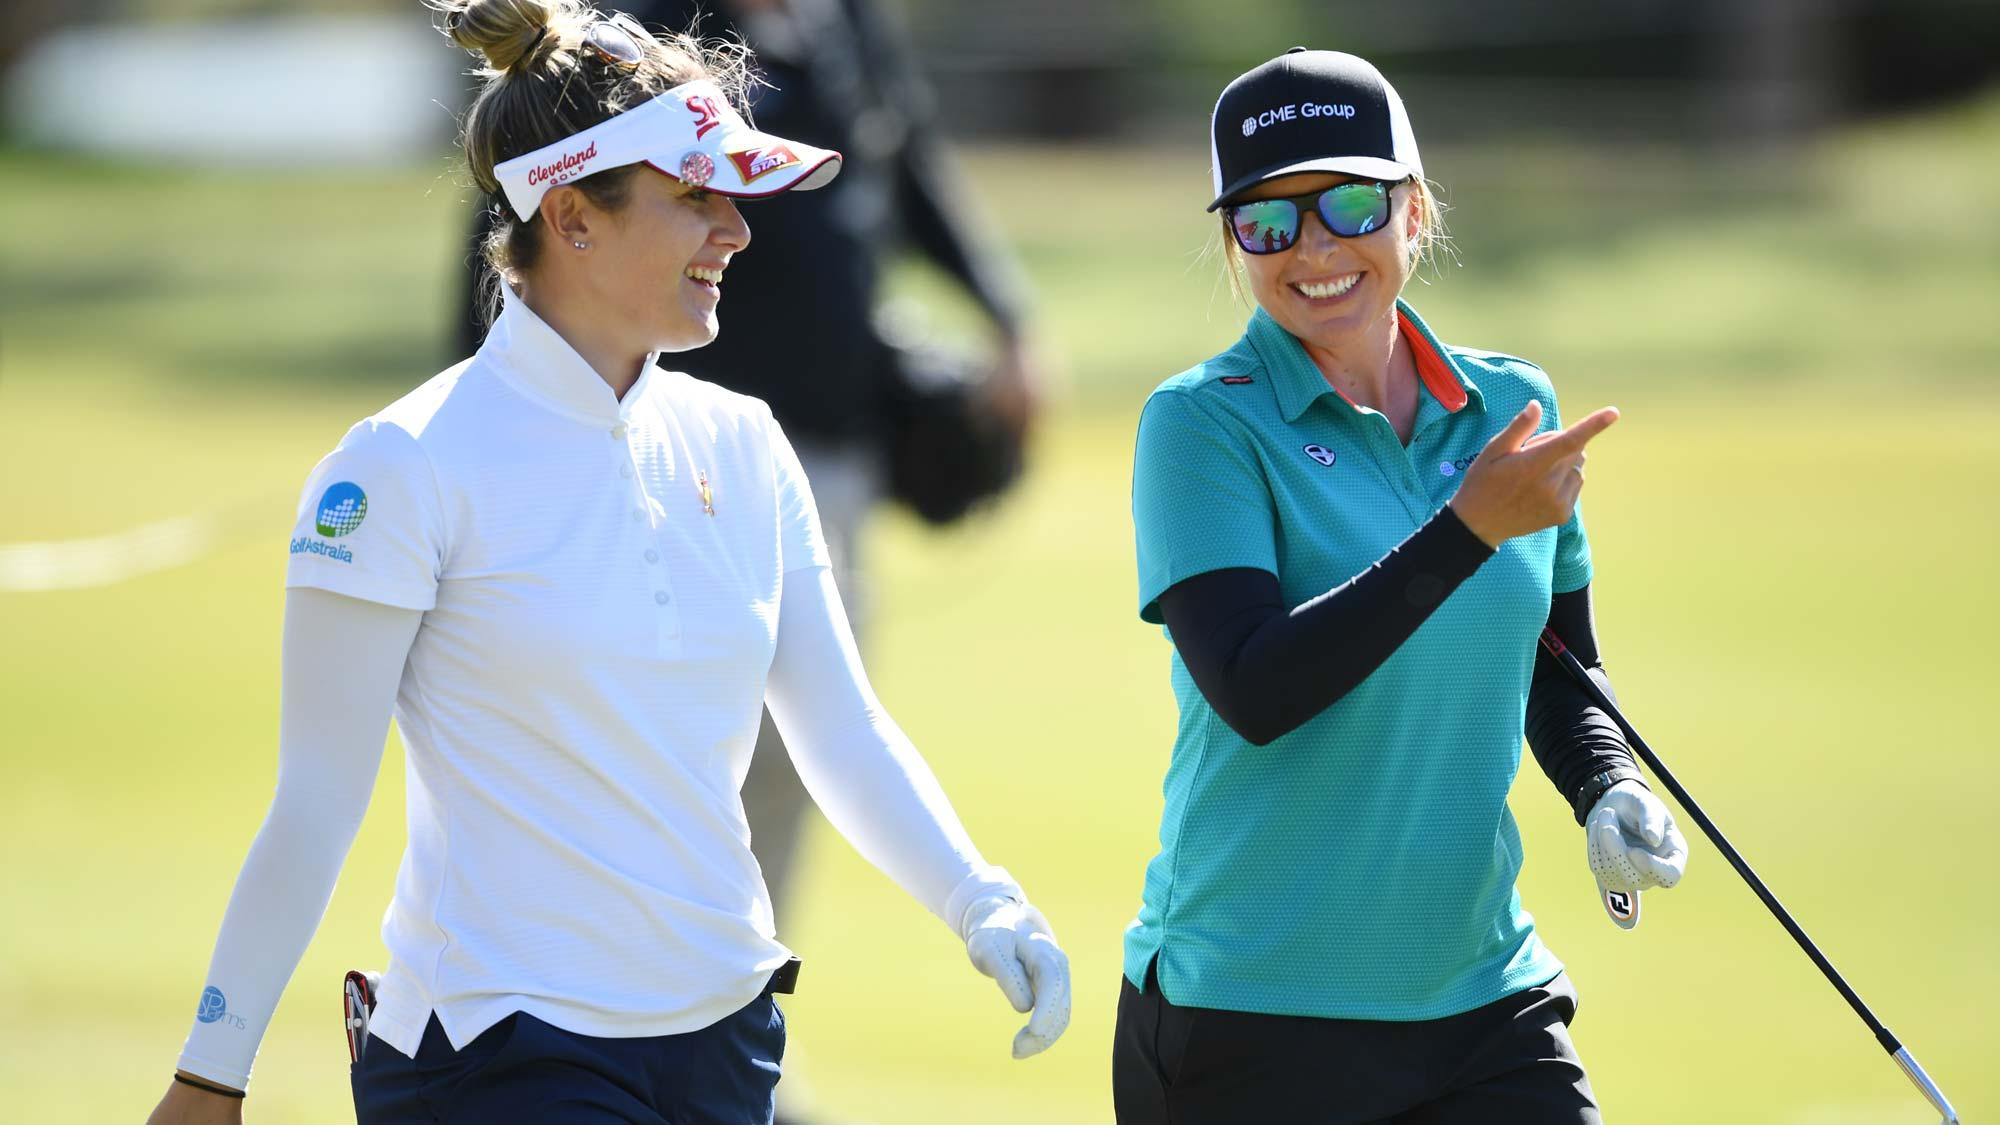 Kemp And Green Lead The Way At 2019 Isps Handa Womens Australian Open Lpga Ladies Professional Golf Association